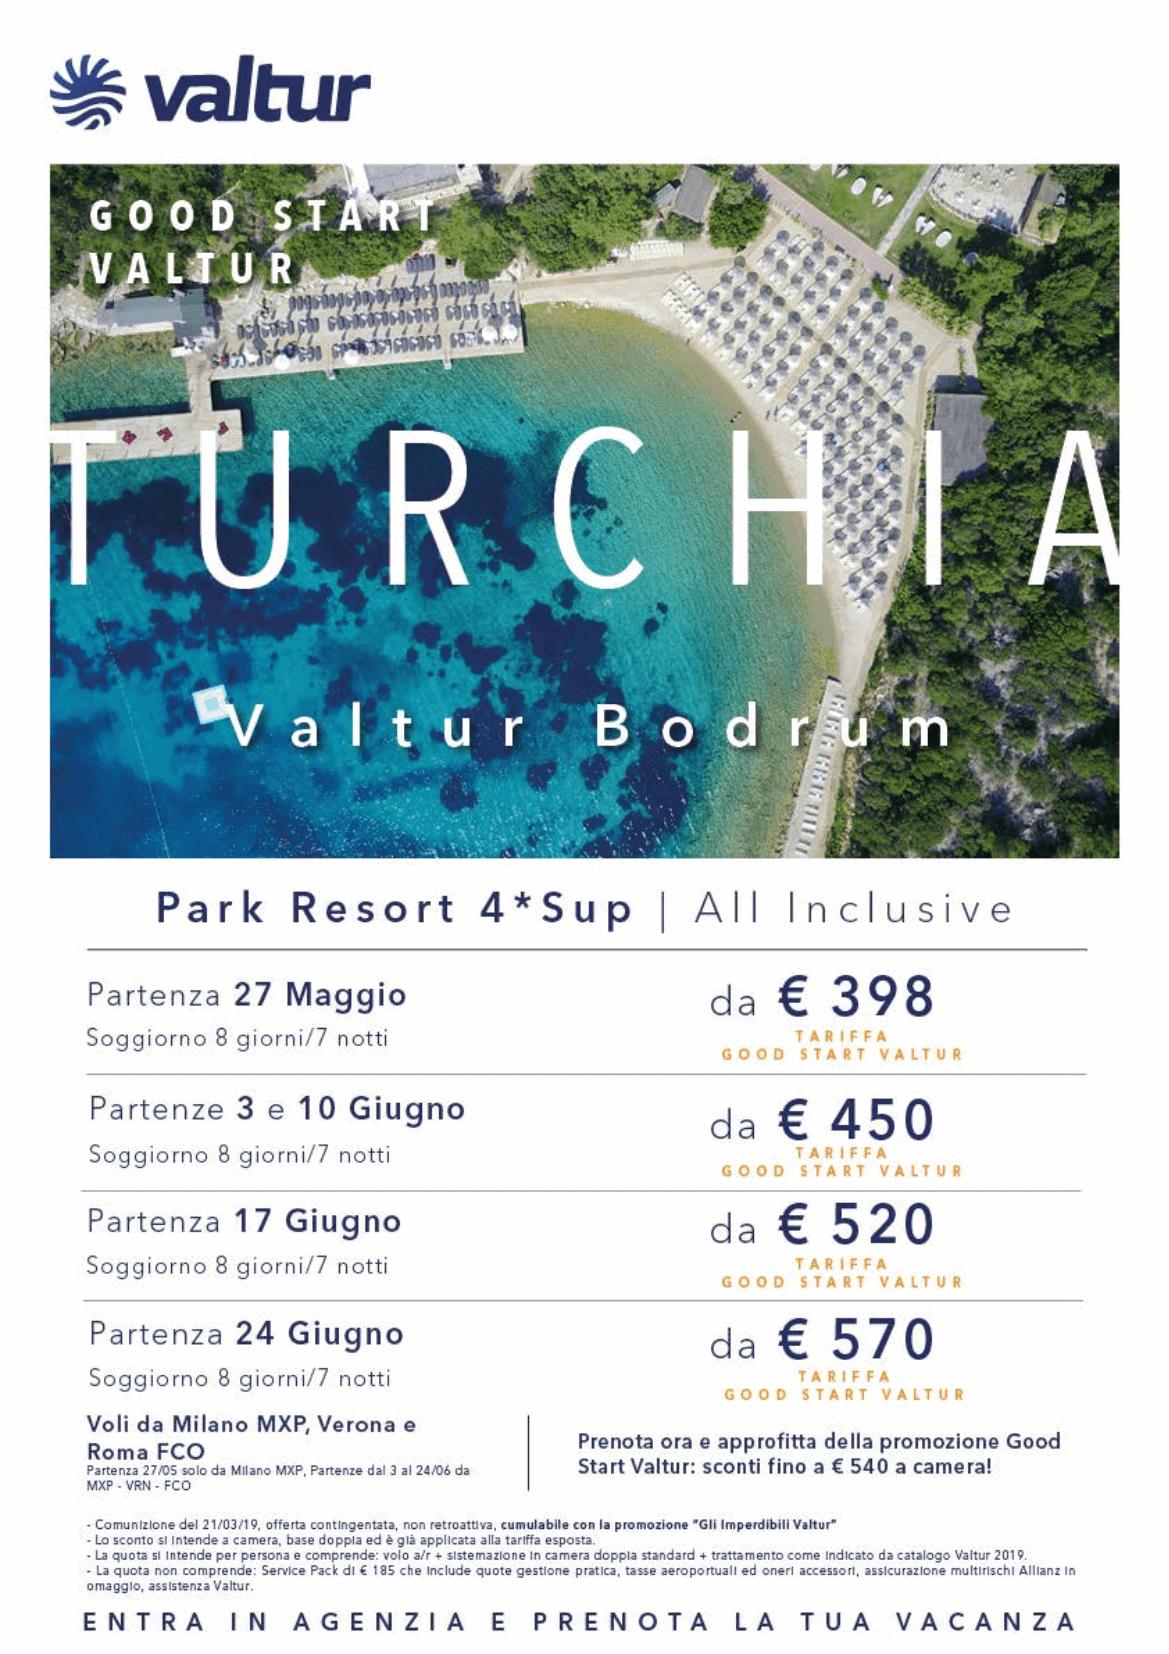 Valtur_Turichia